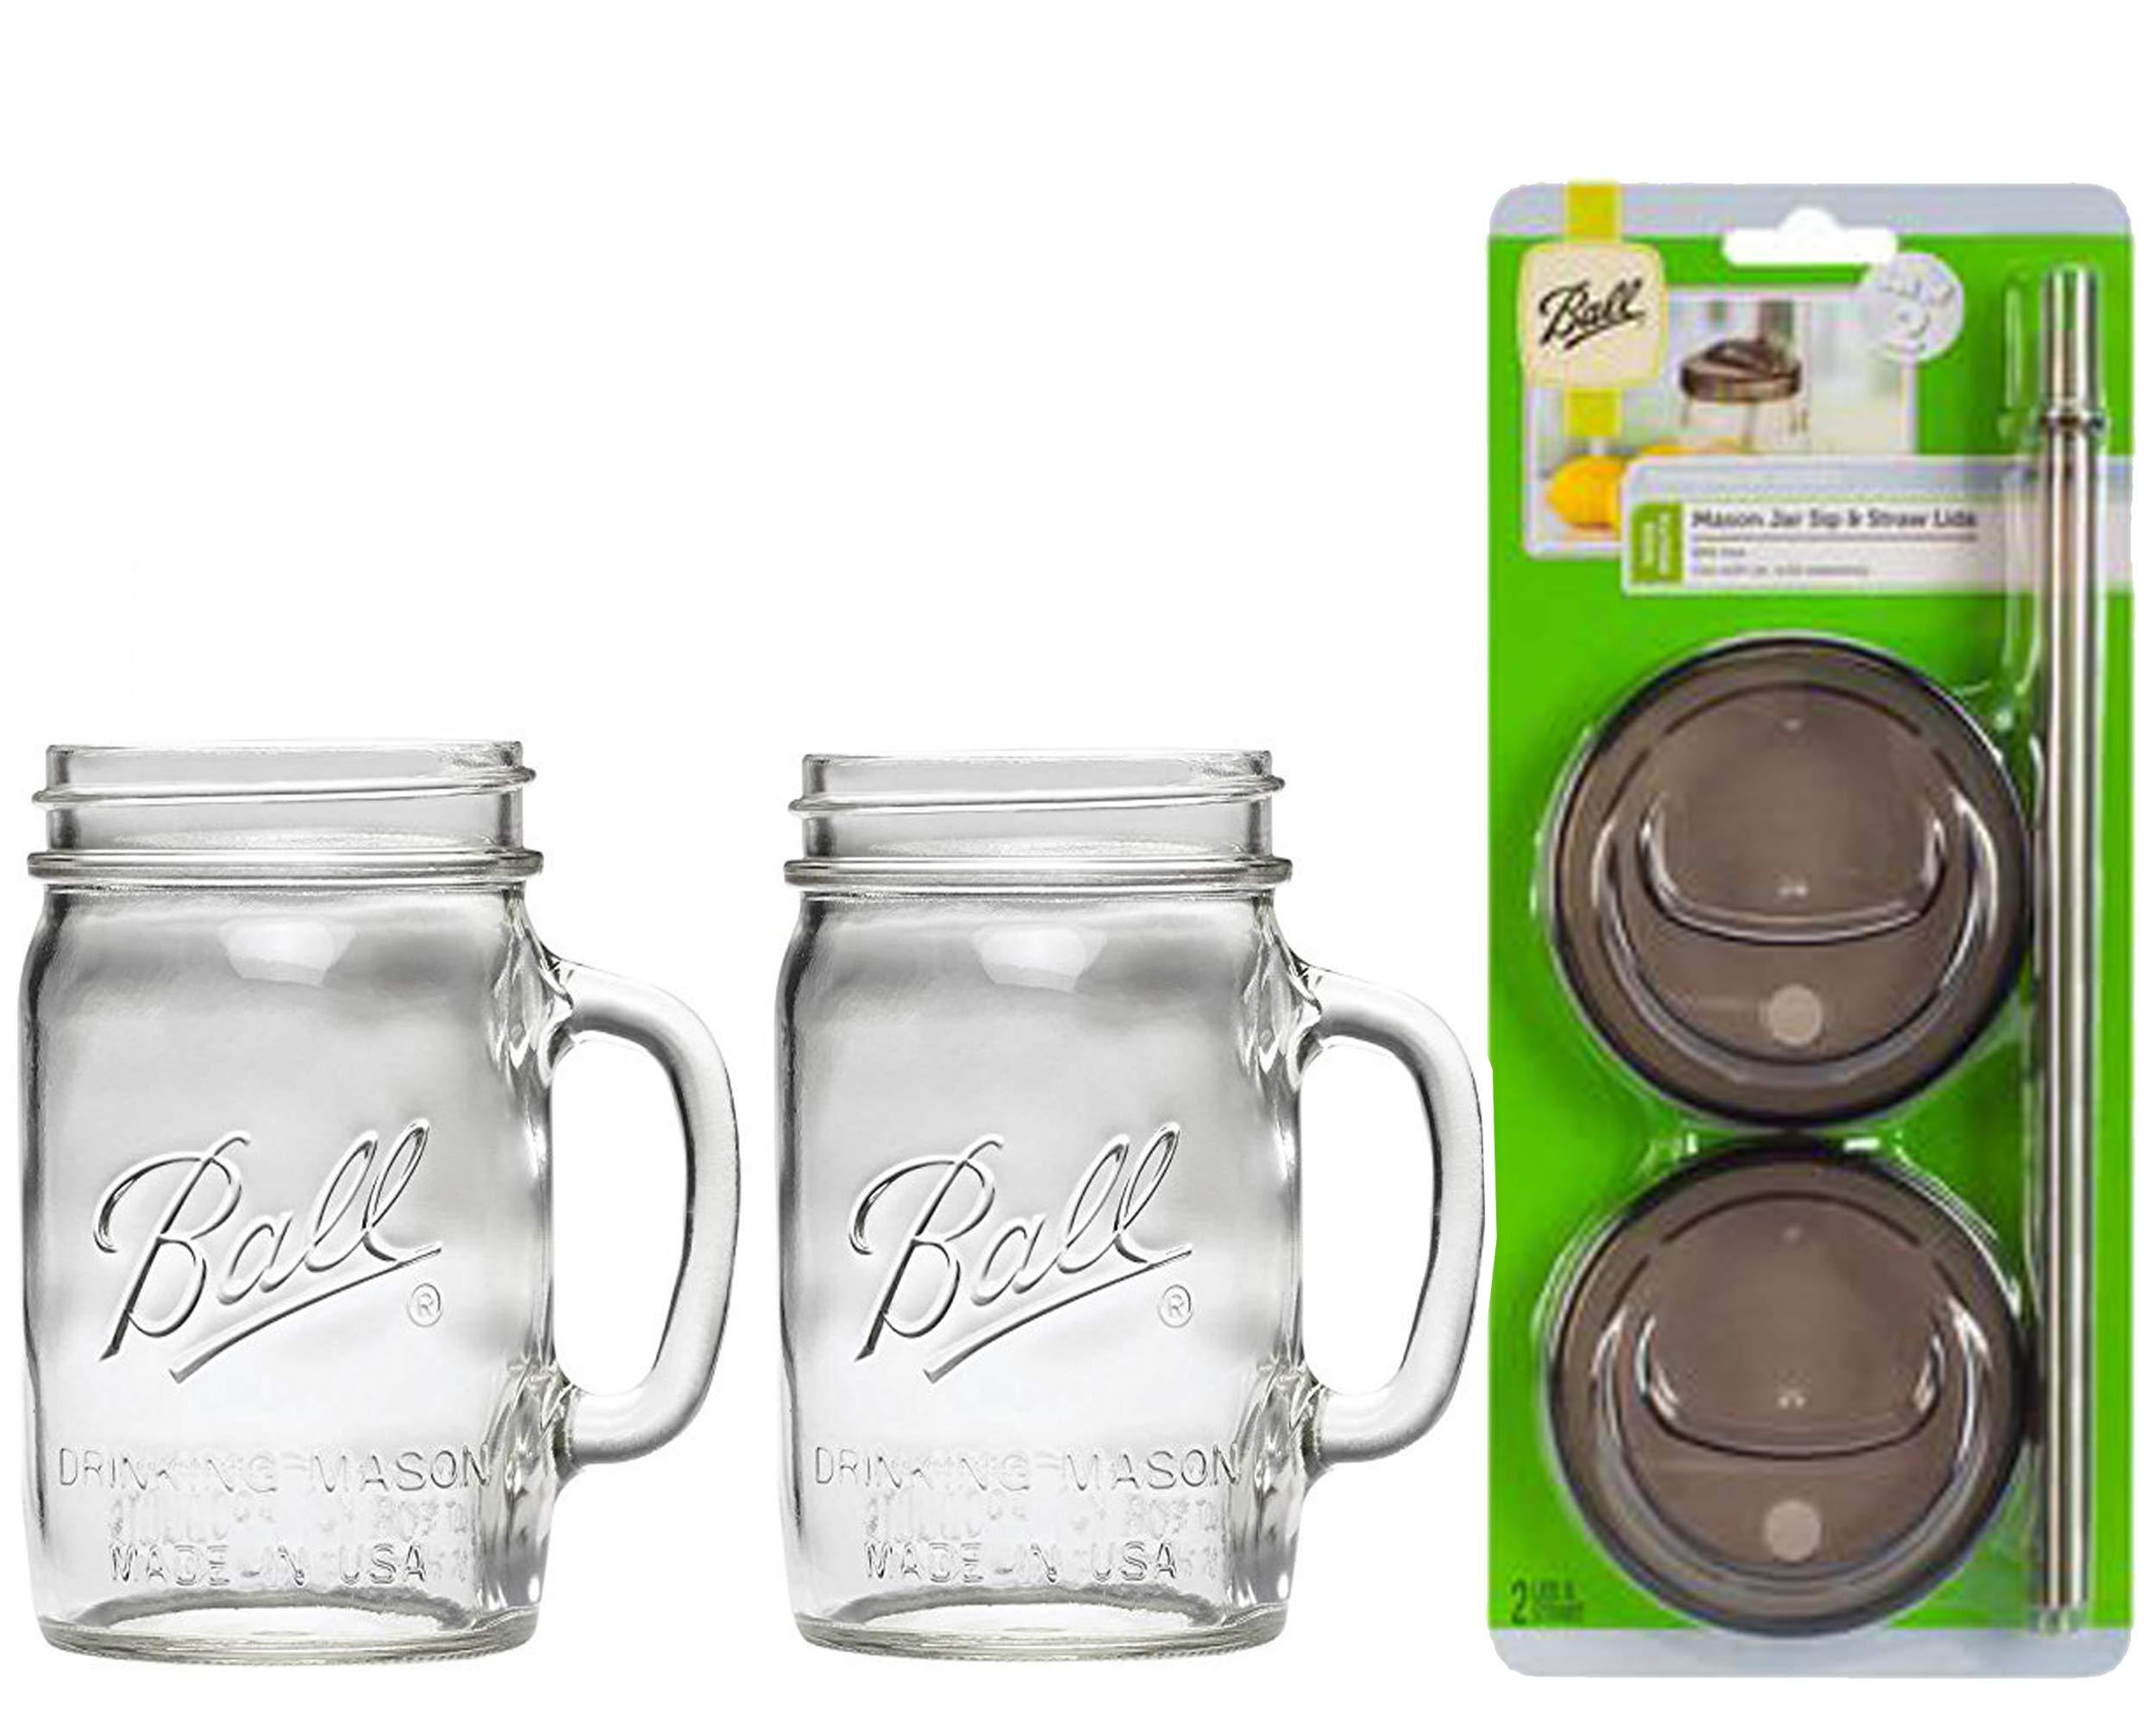 2 Ball Glass Mason Drinking Jars with 2 Sip and Straw Lids (2, 24oz Mug) by Ball (Image #1)